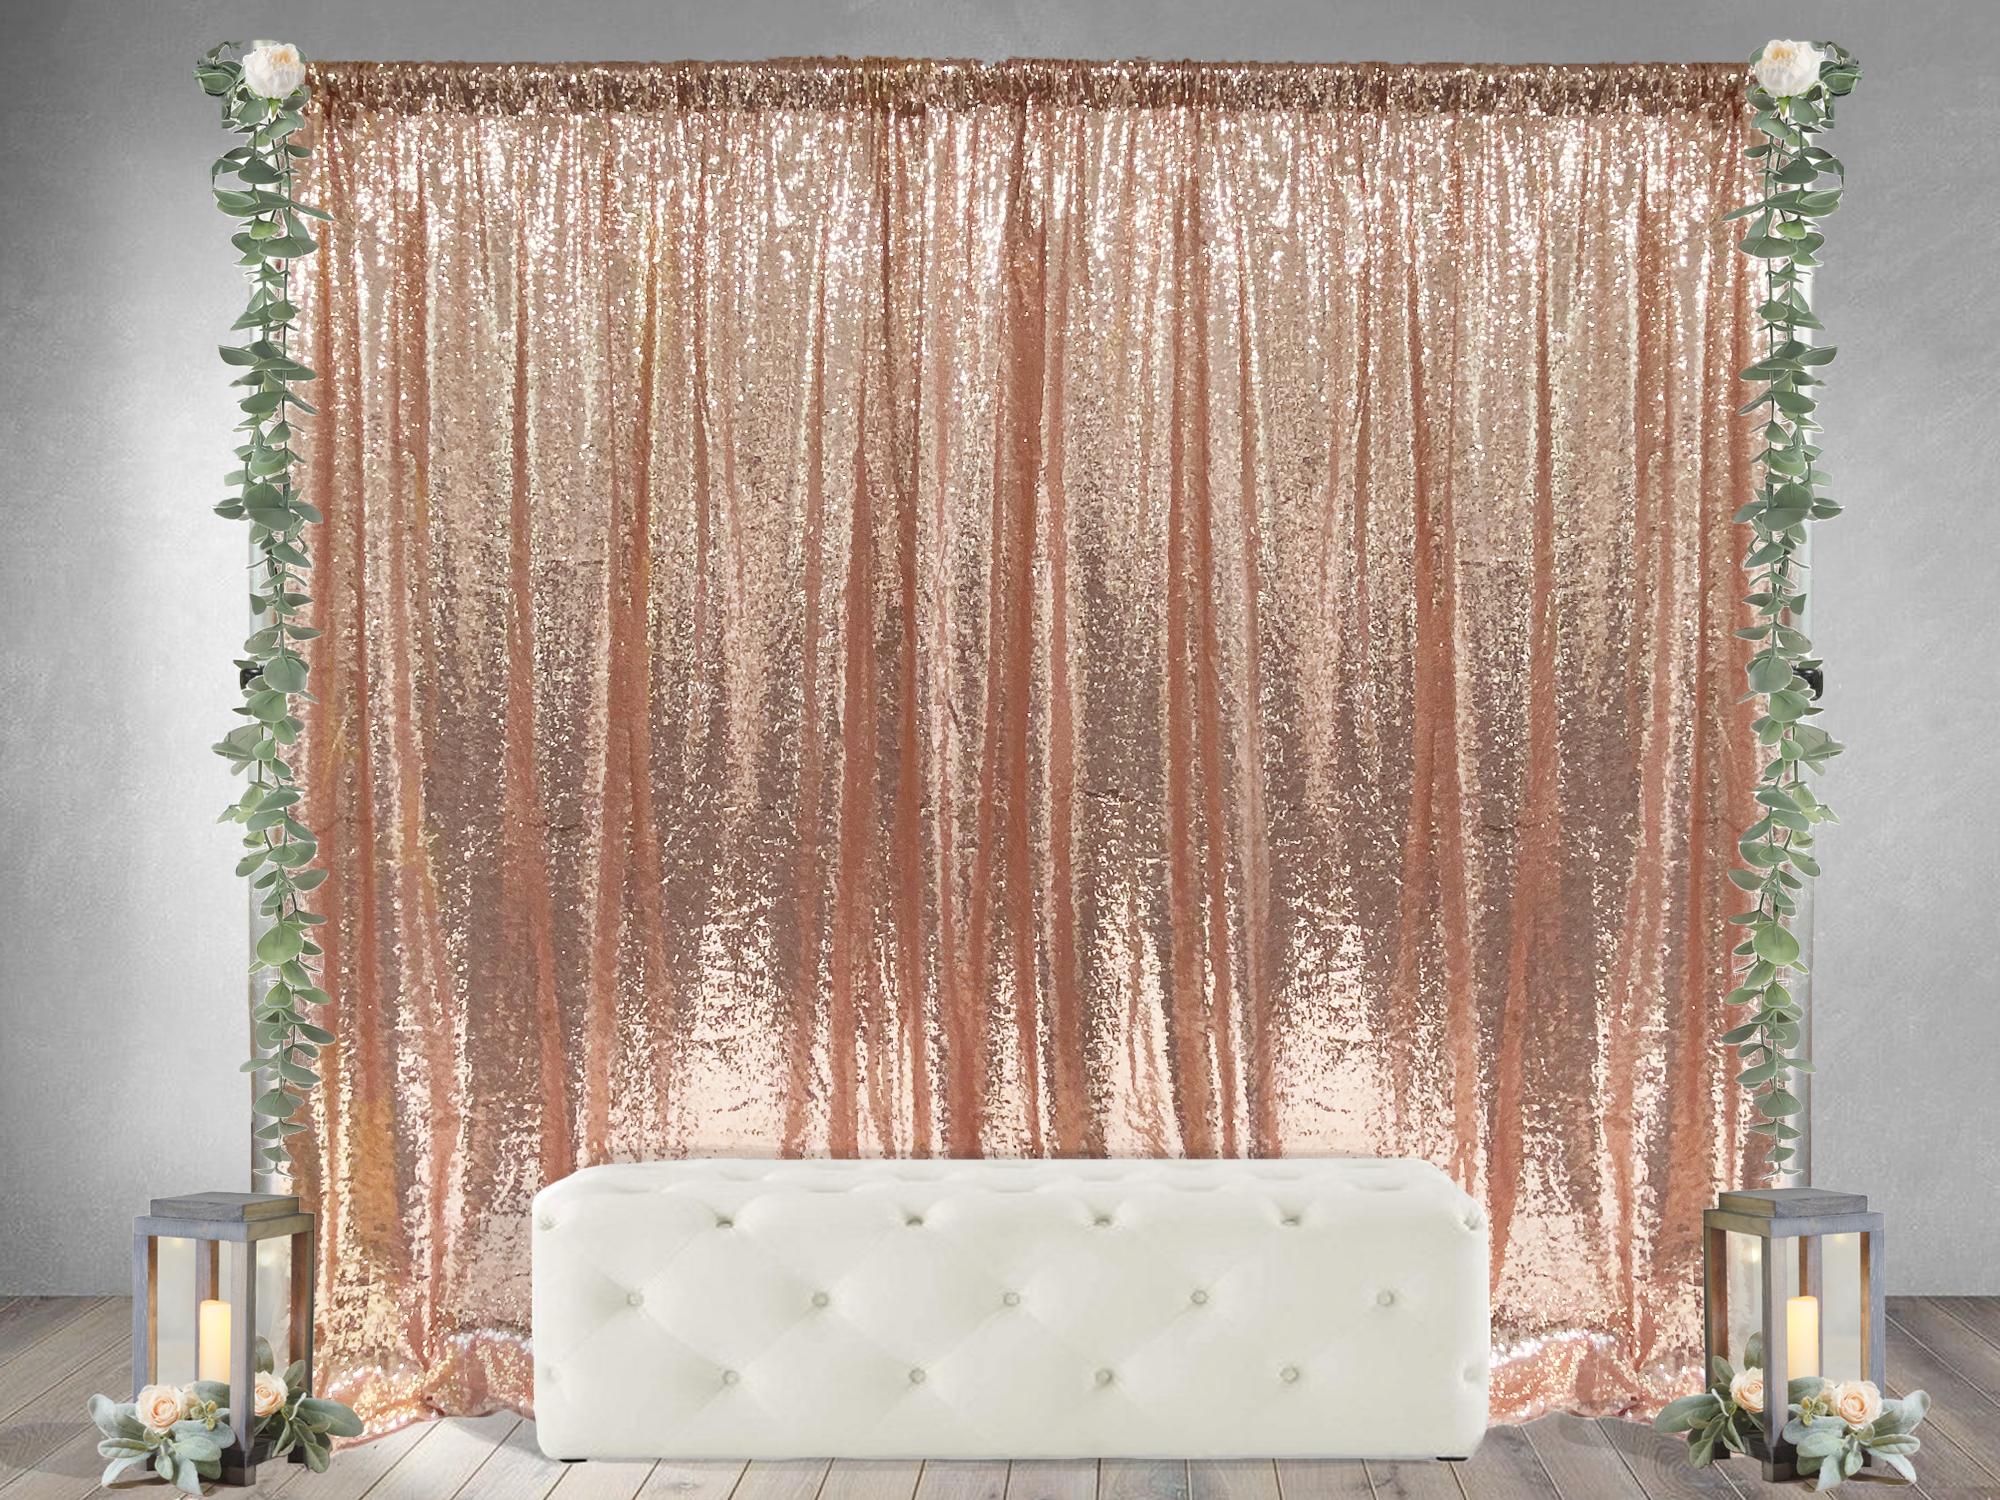 glitz-crinkle-blush-drape-full-3.jpg